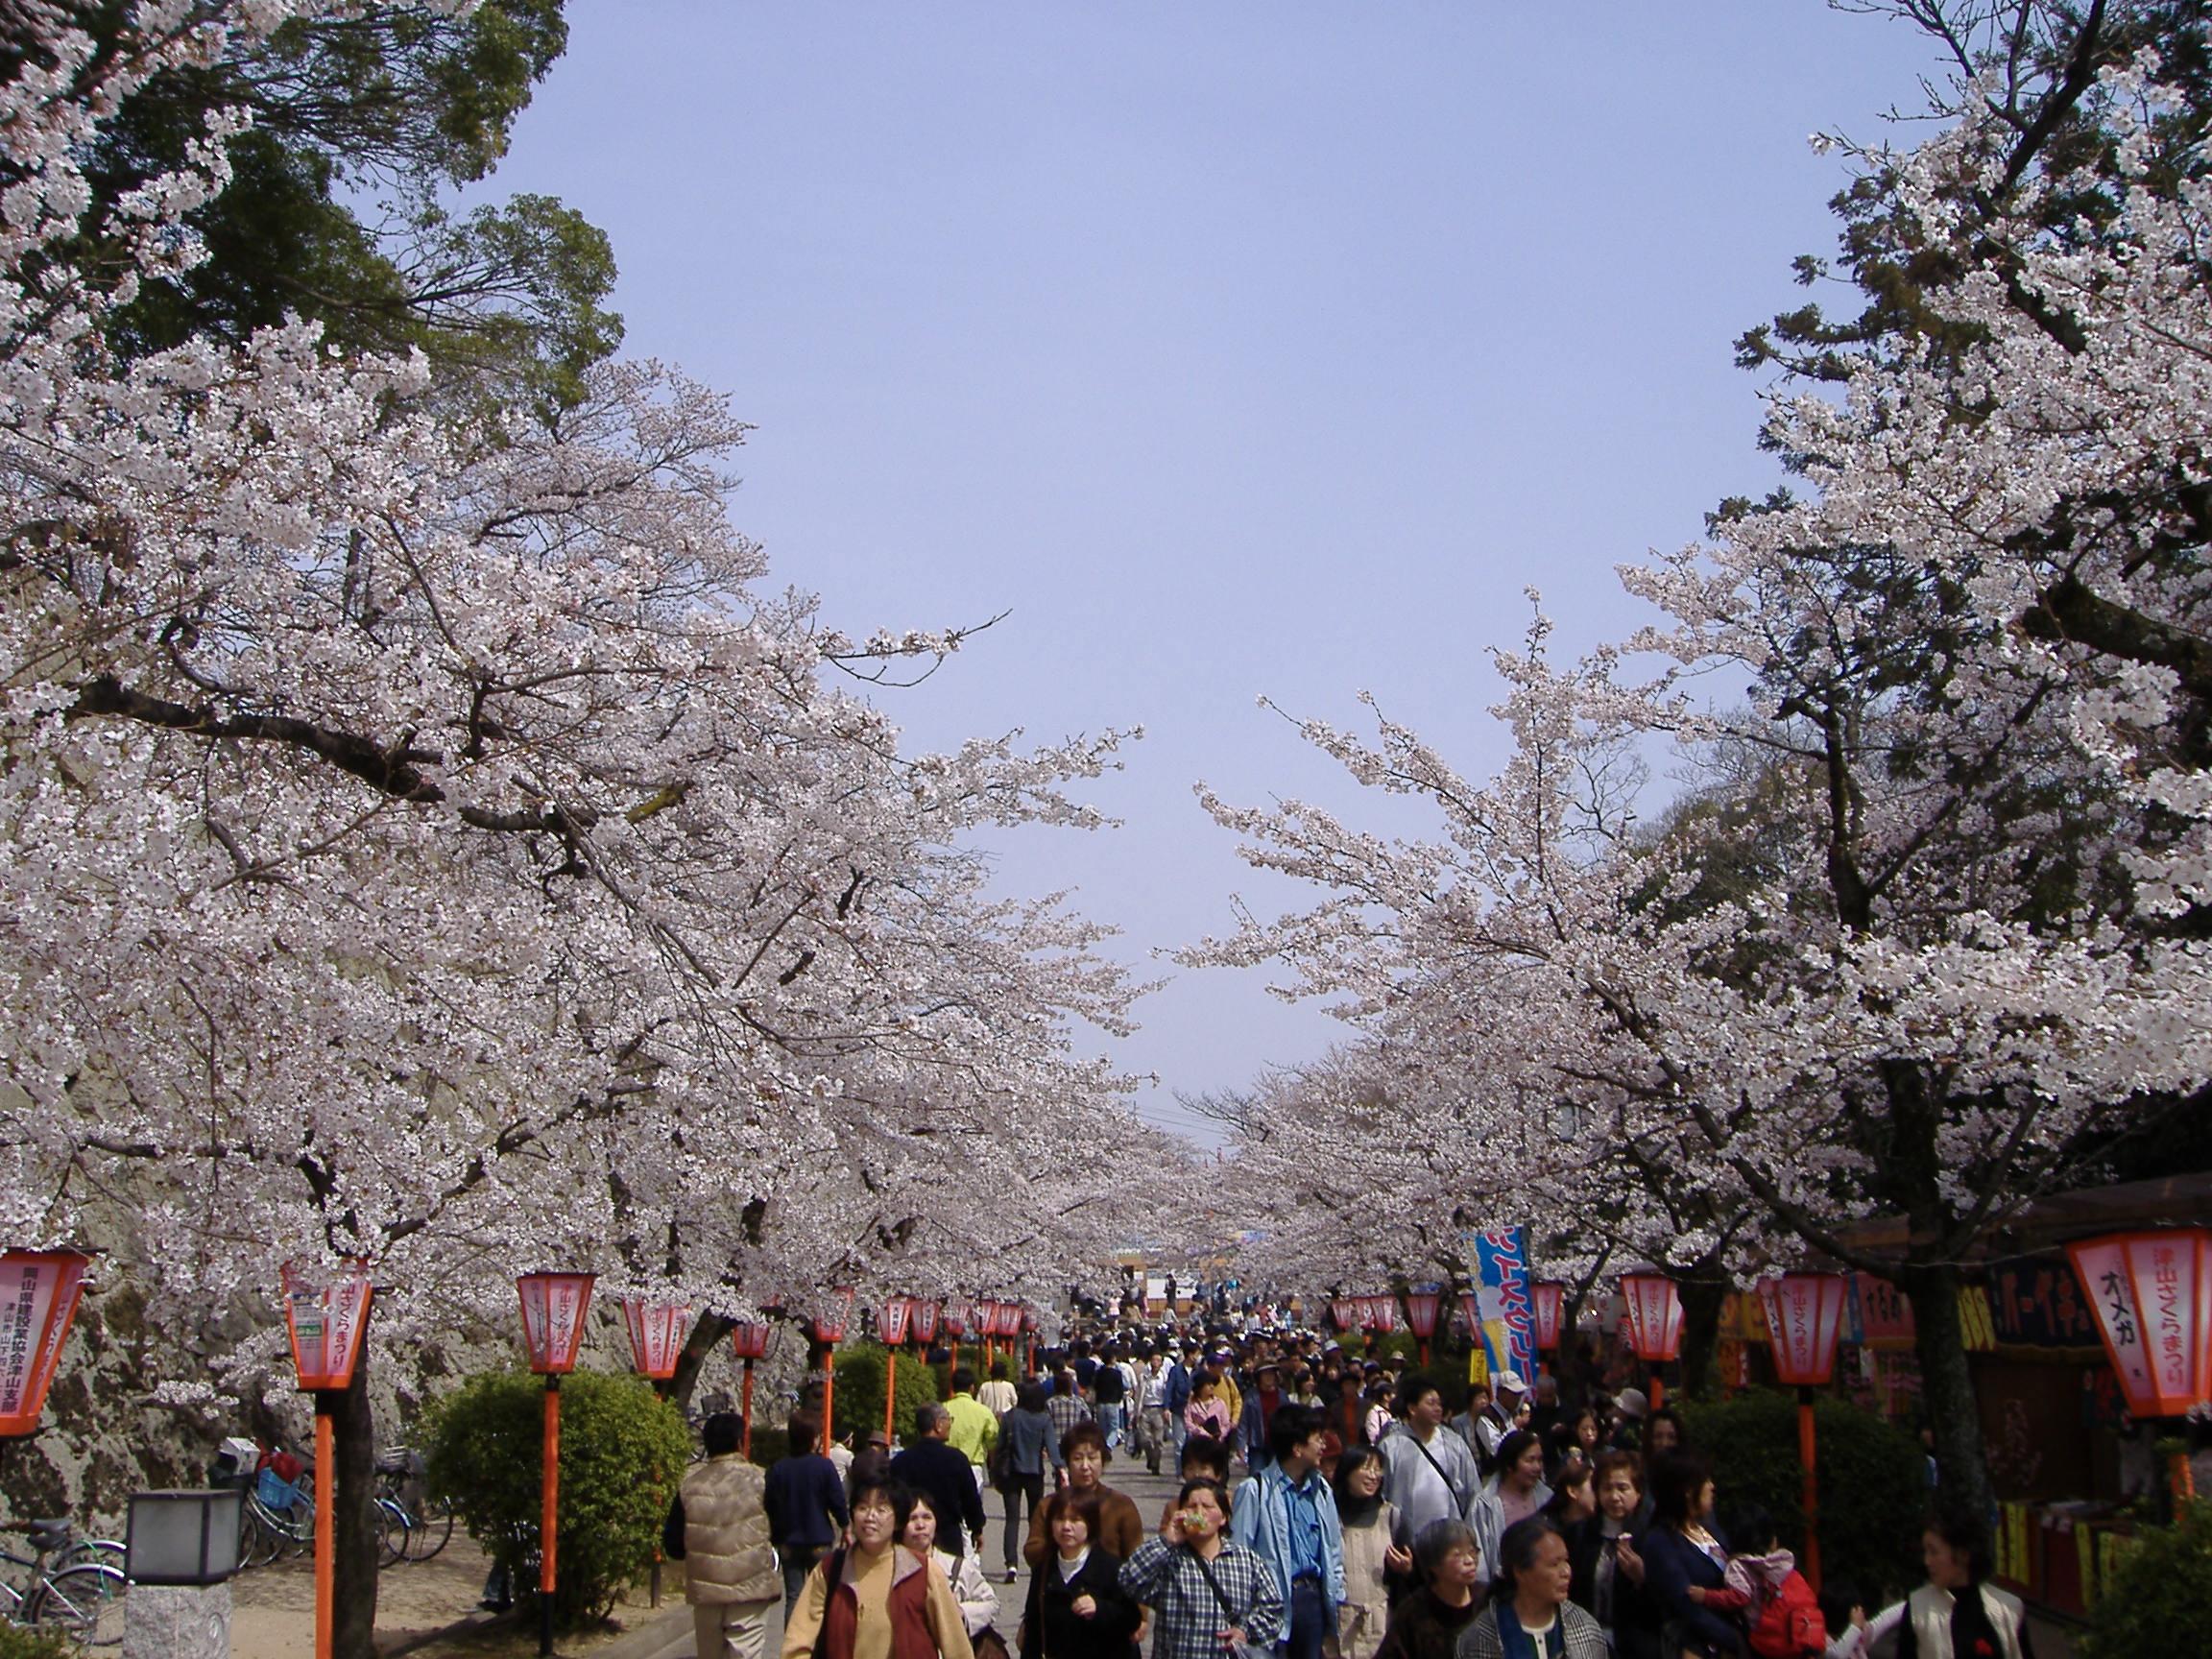 cherry blossom festival - HD1600×1200